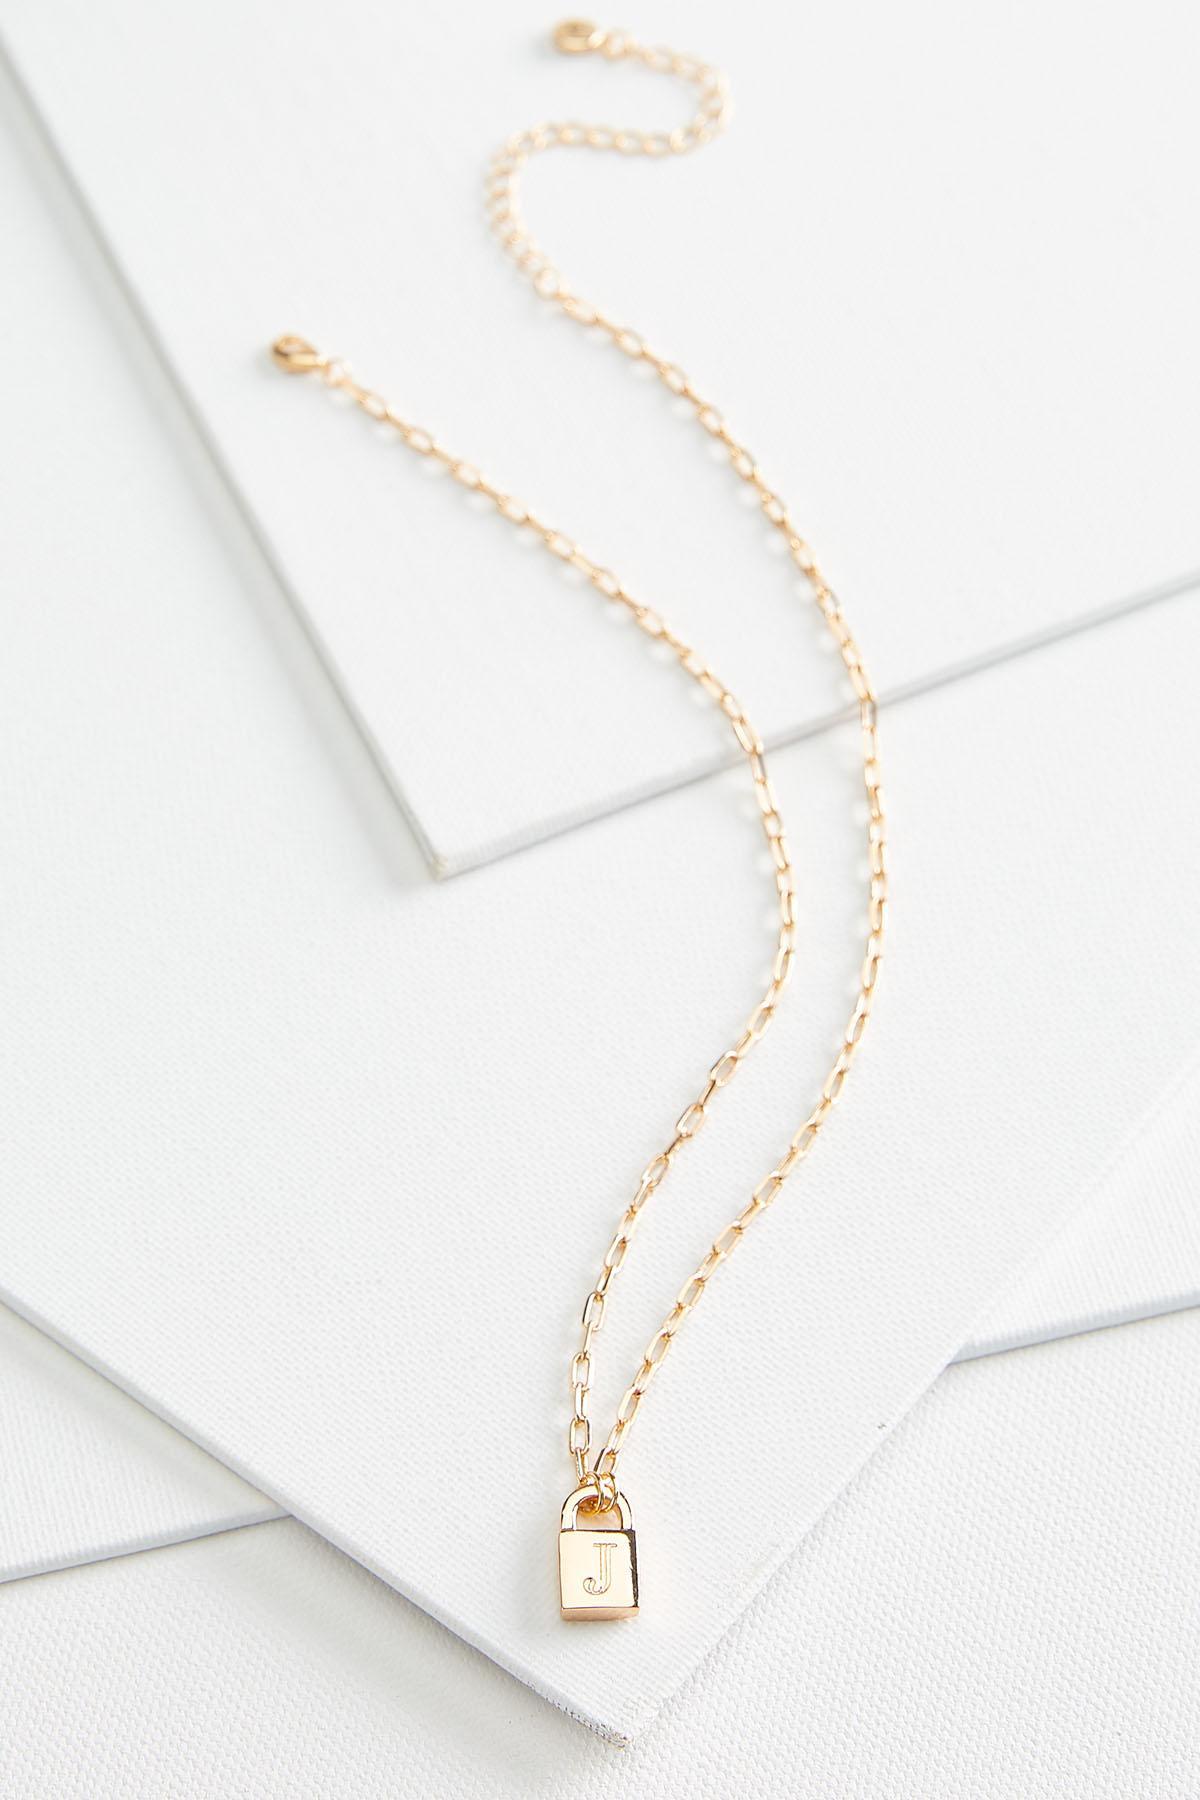 J Locket Pendant Necklace